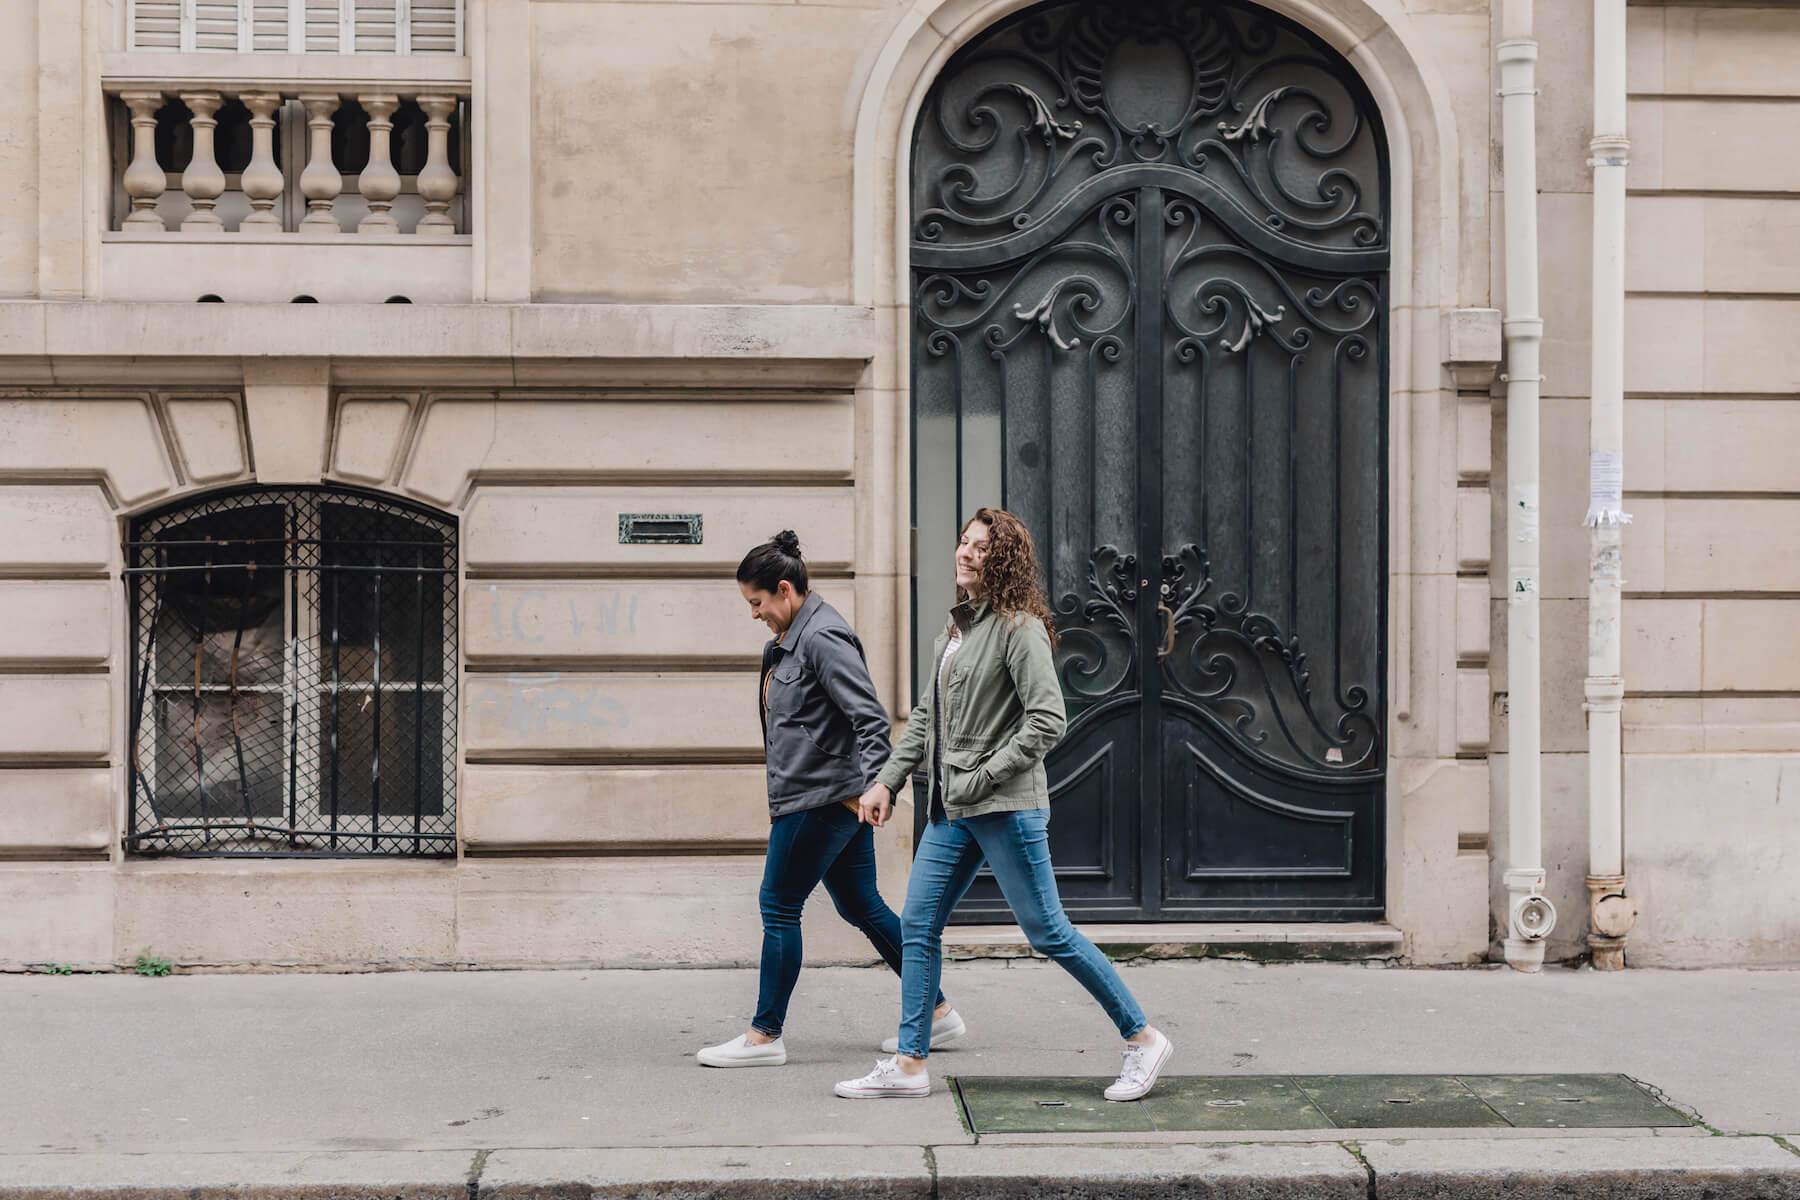 paris-03-06-2020-engagement-trip-30_original